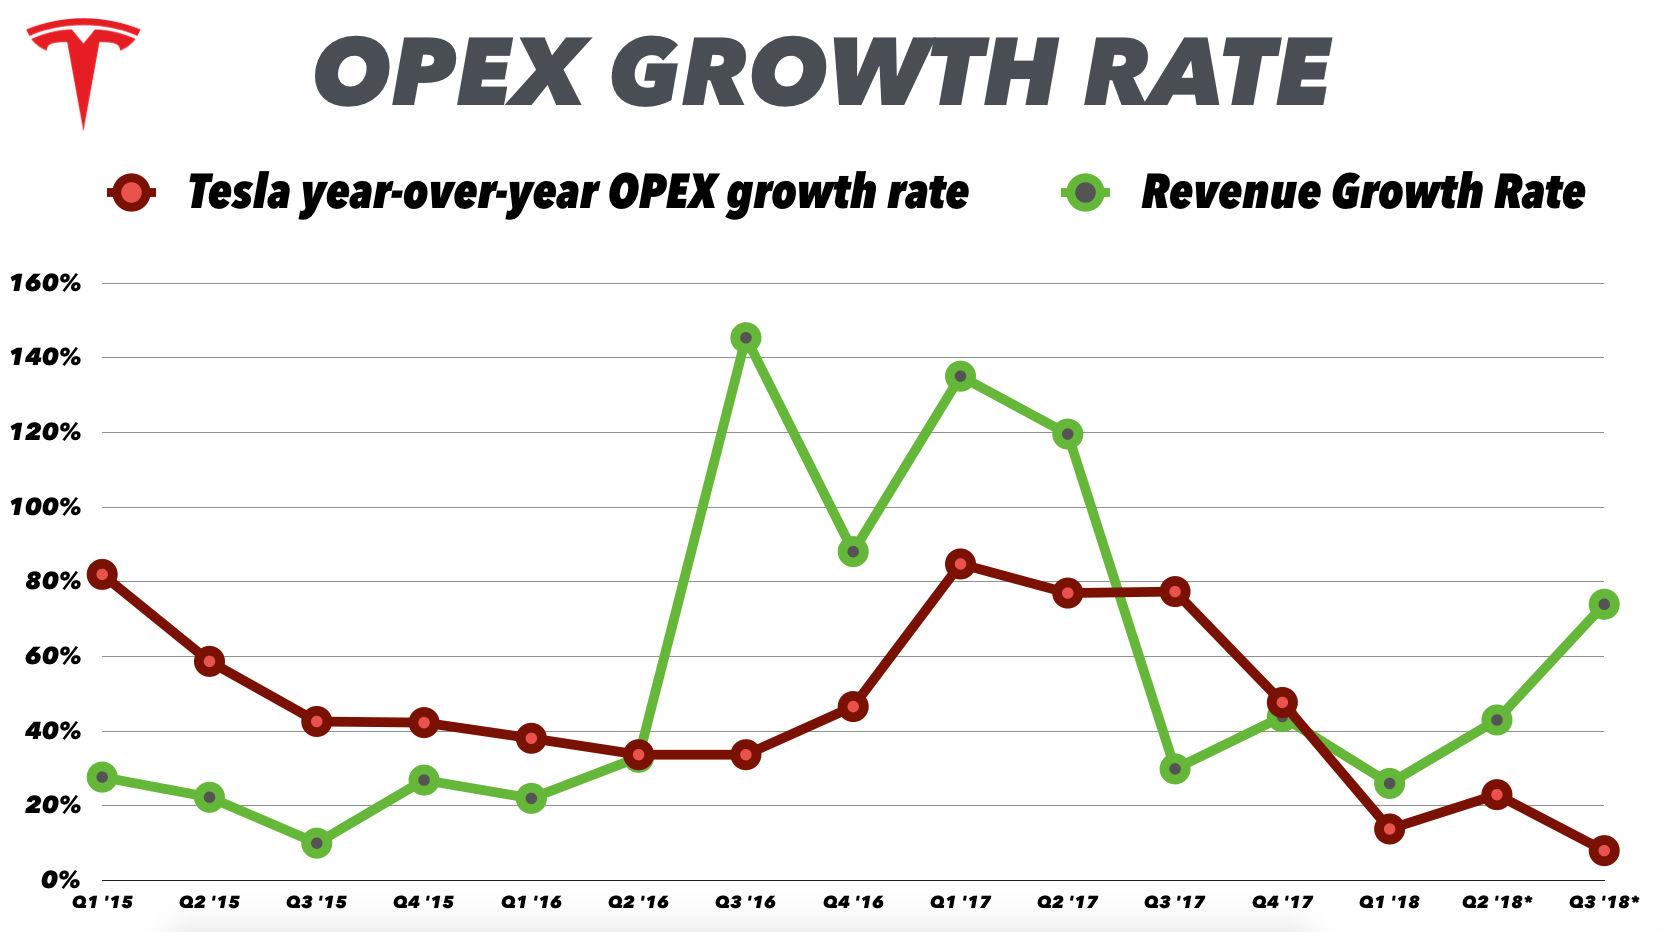 tesla-opex-revenue-growth-q3-2018-estimate